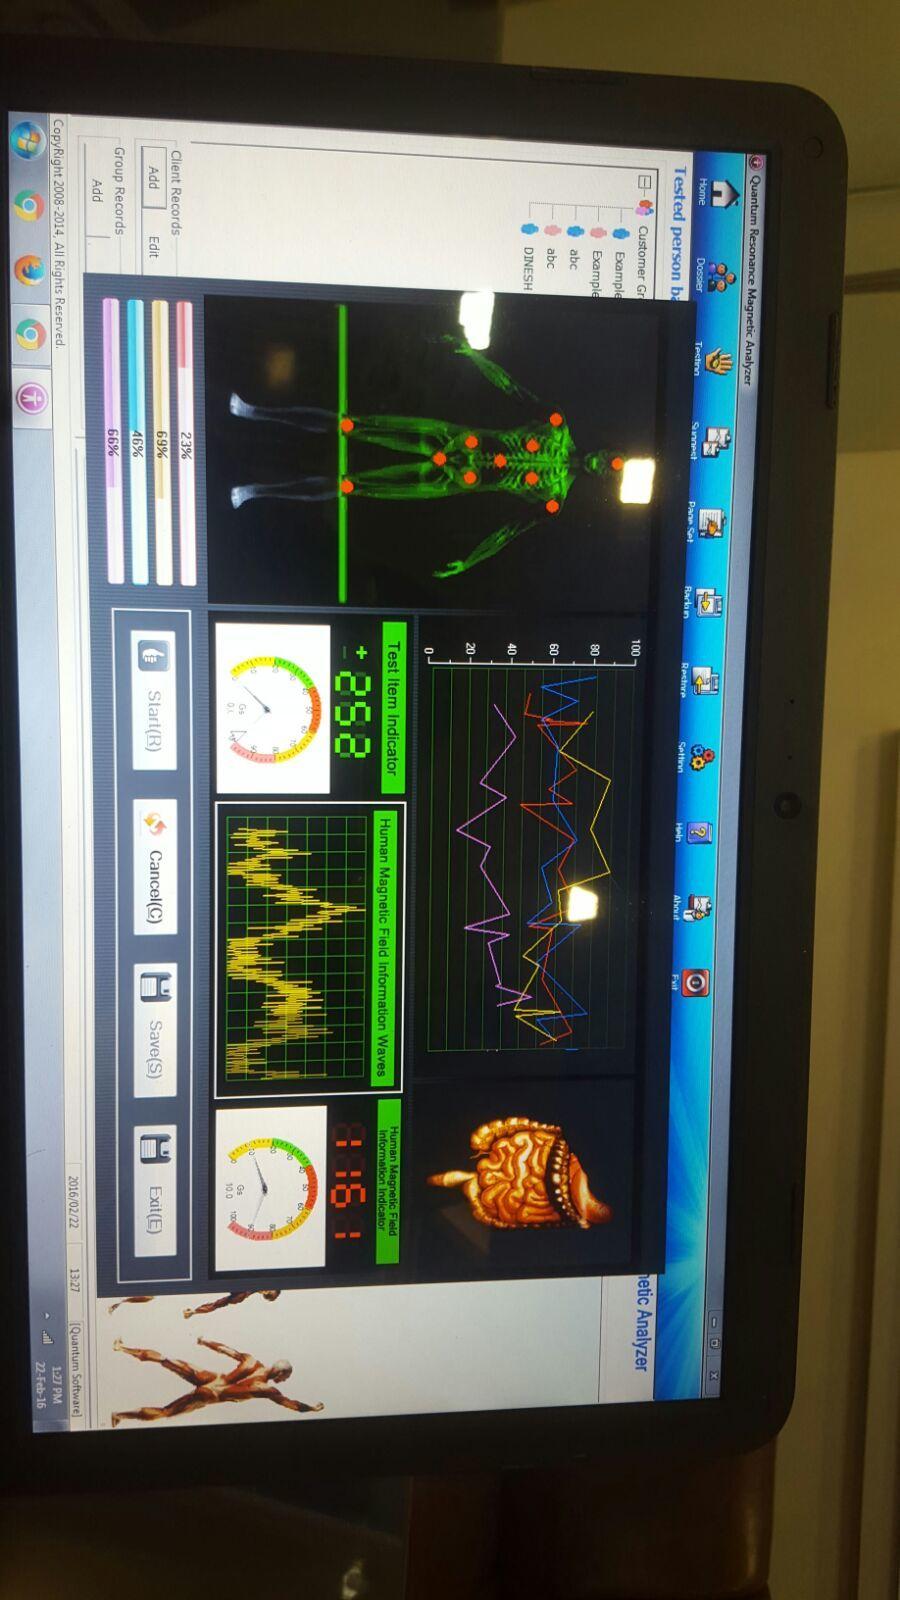 Quantum Magnetic Resonance Health Analyzer